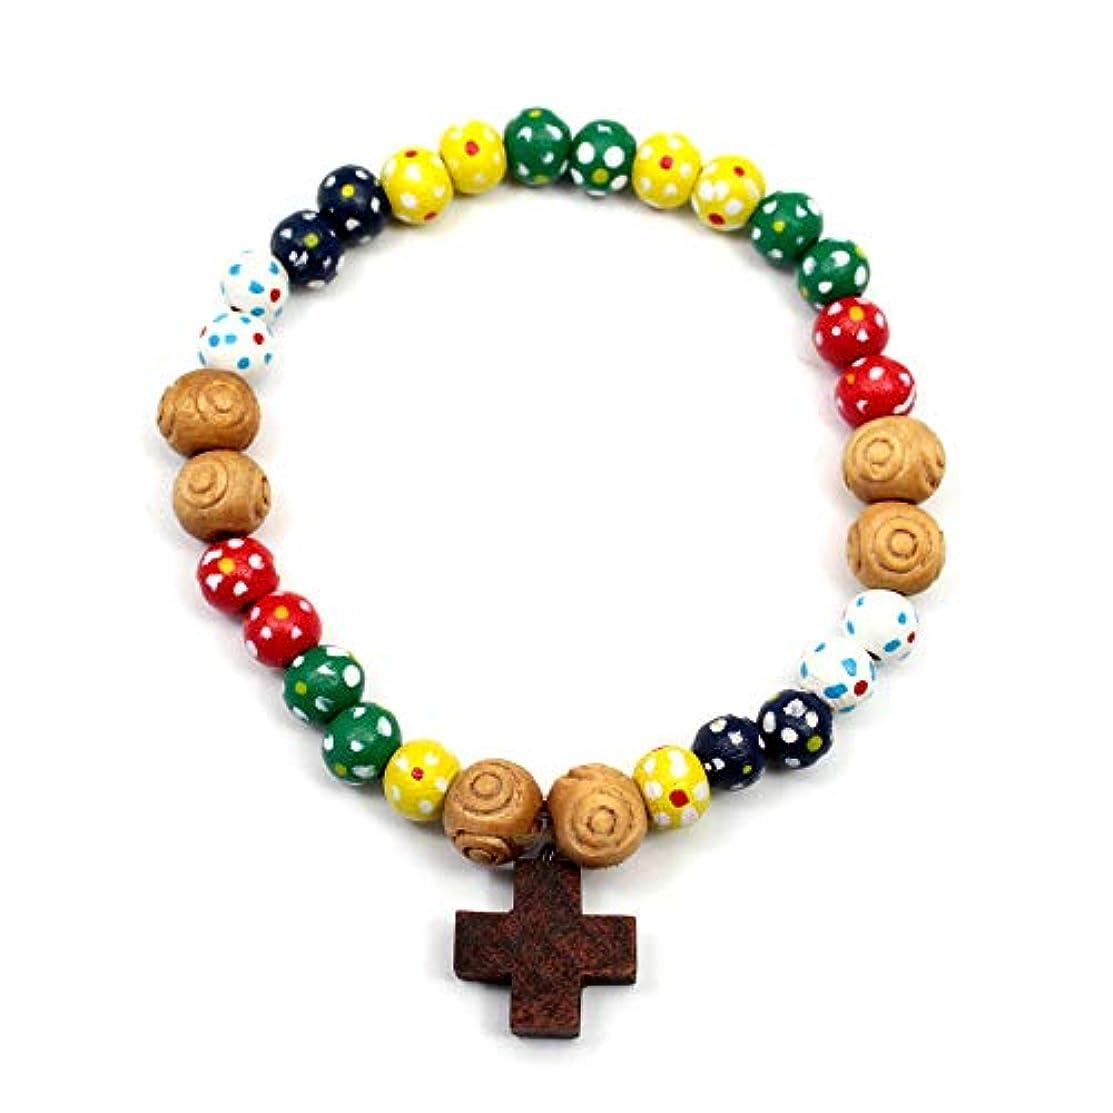 RosaryMart Missionary Wooden Beads Bracelet